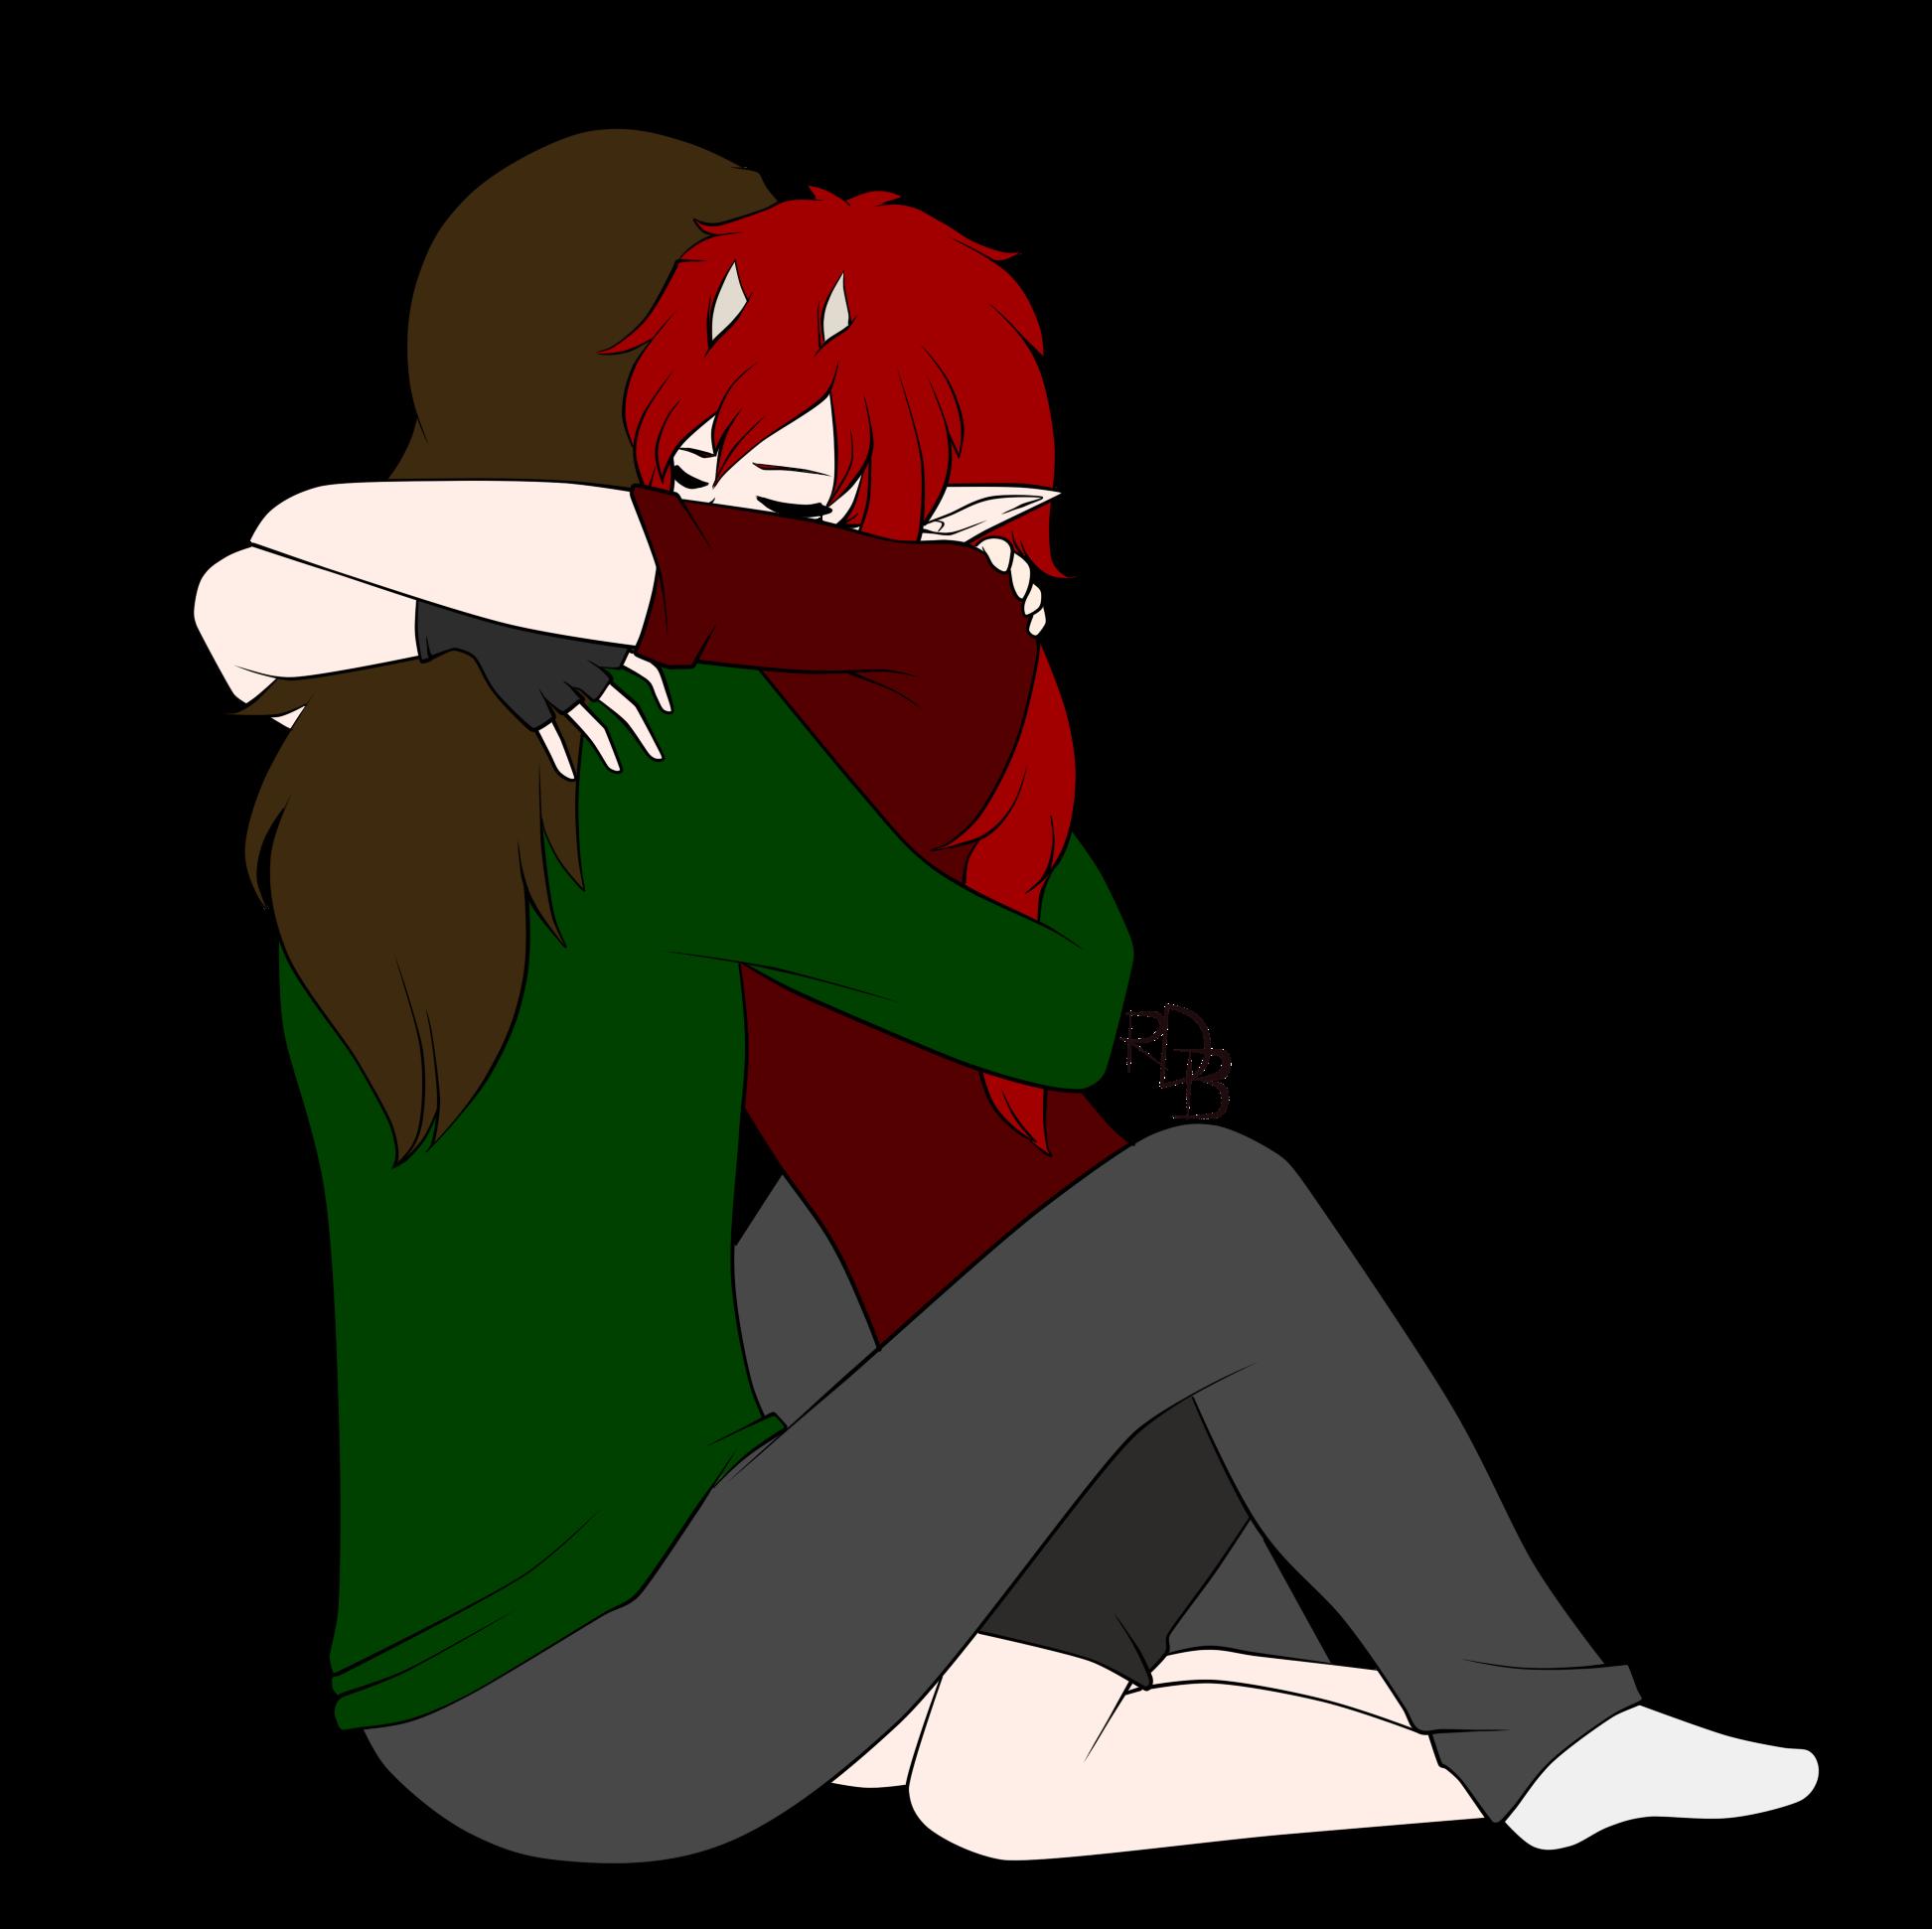 Hug me tight ok by reddeathblood on deviantart - Tight hug wallpaper ...